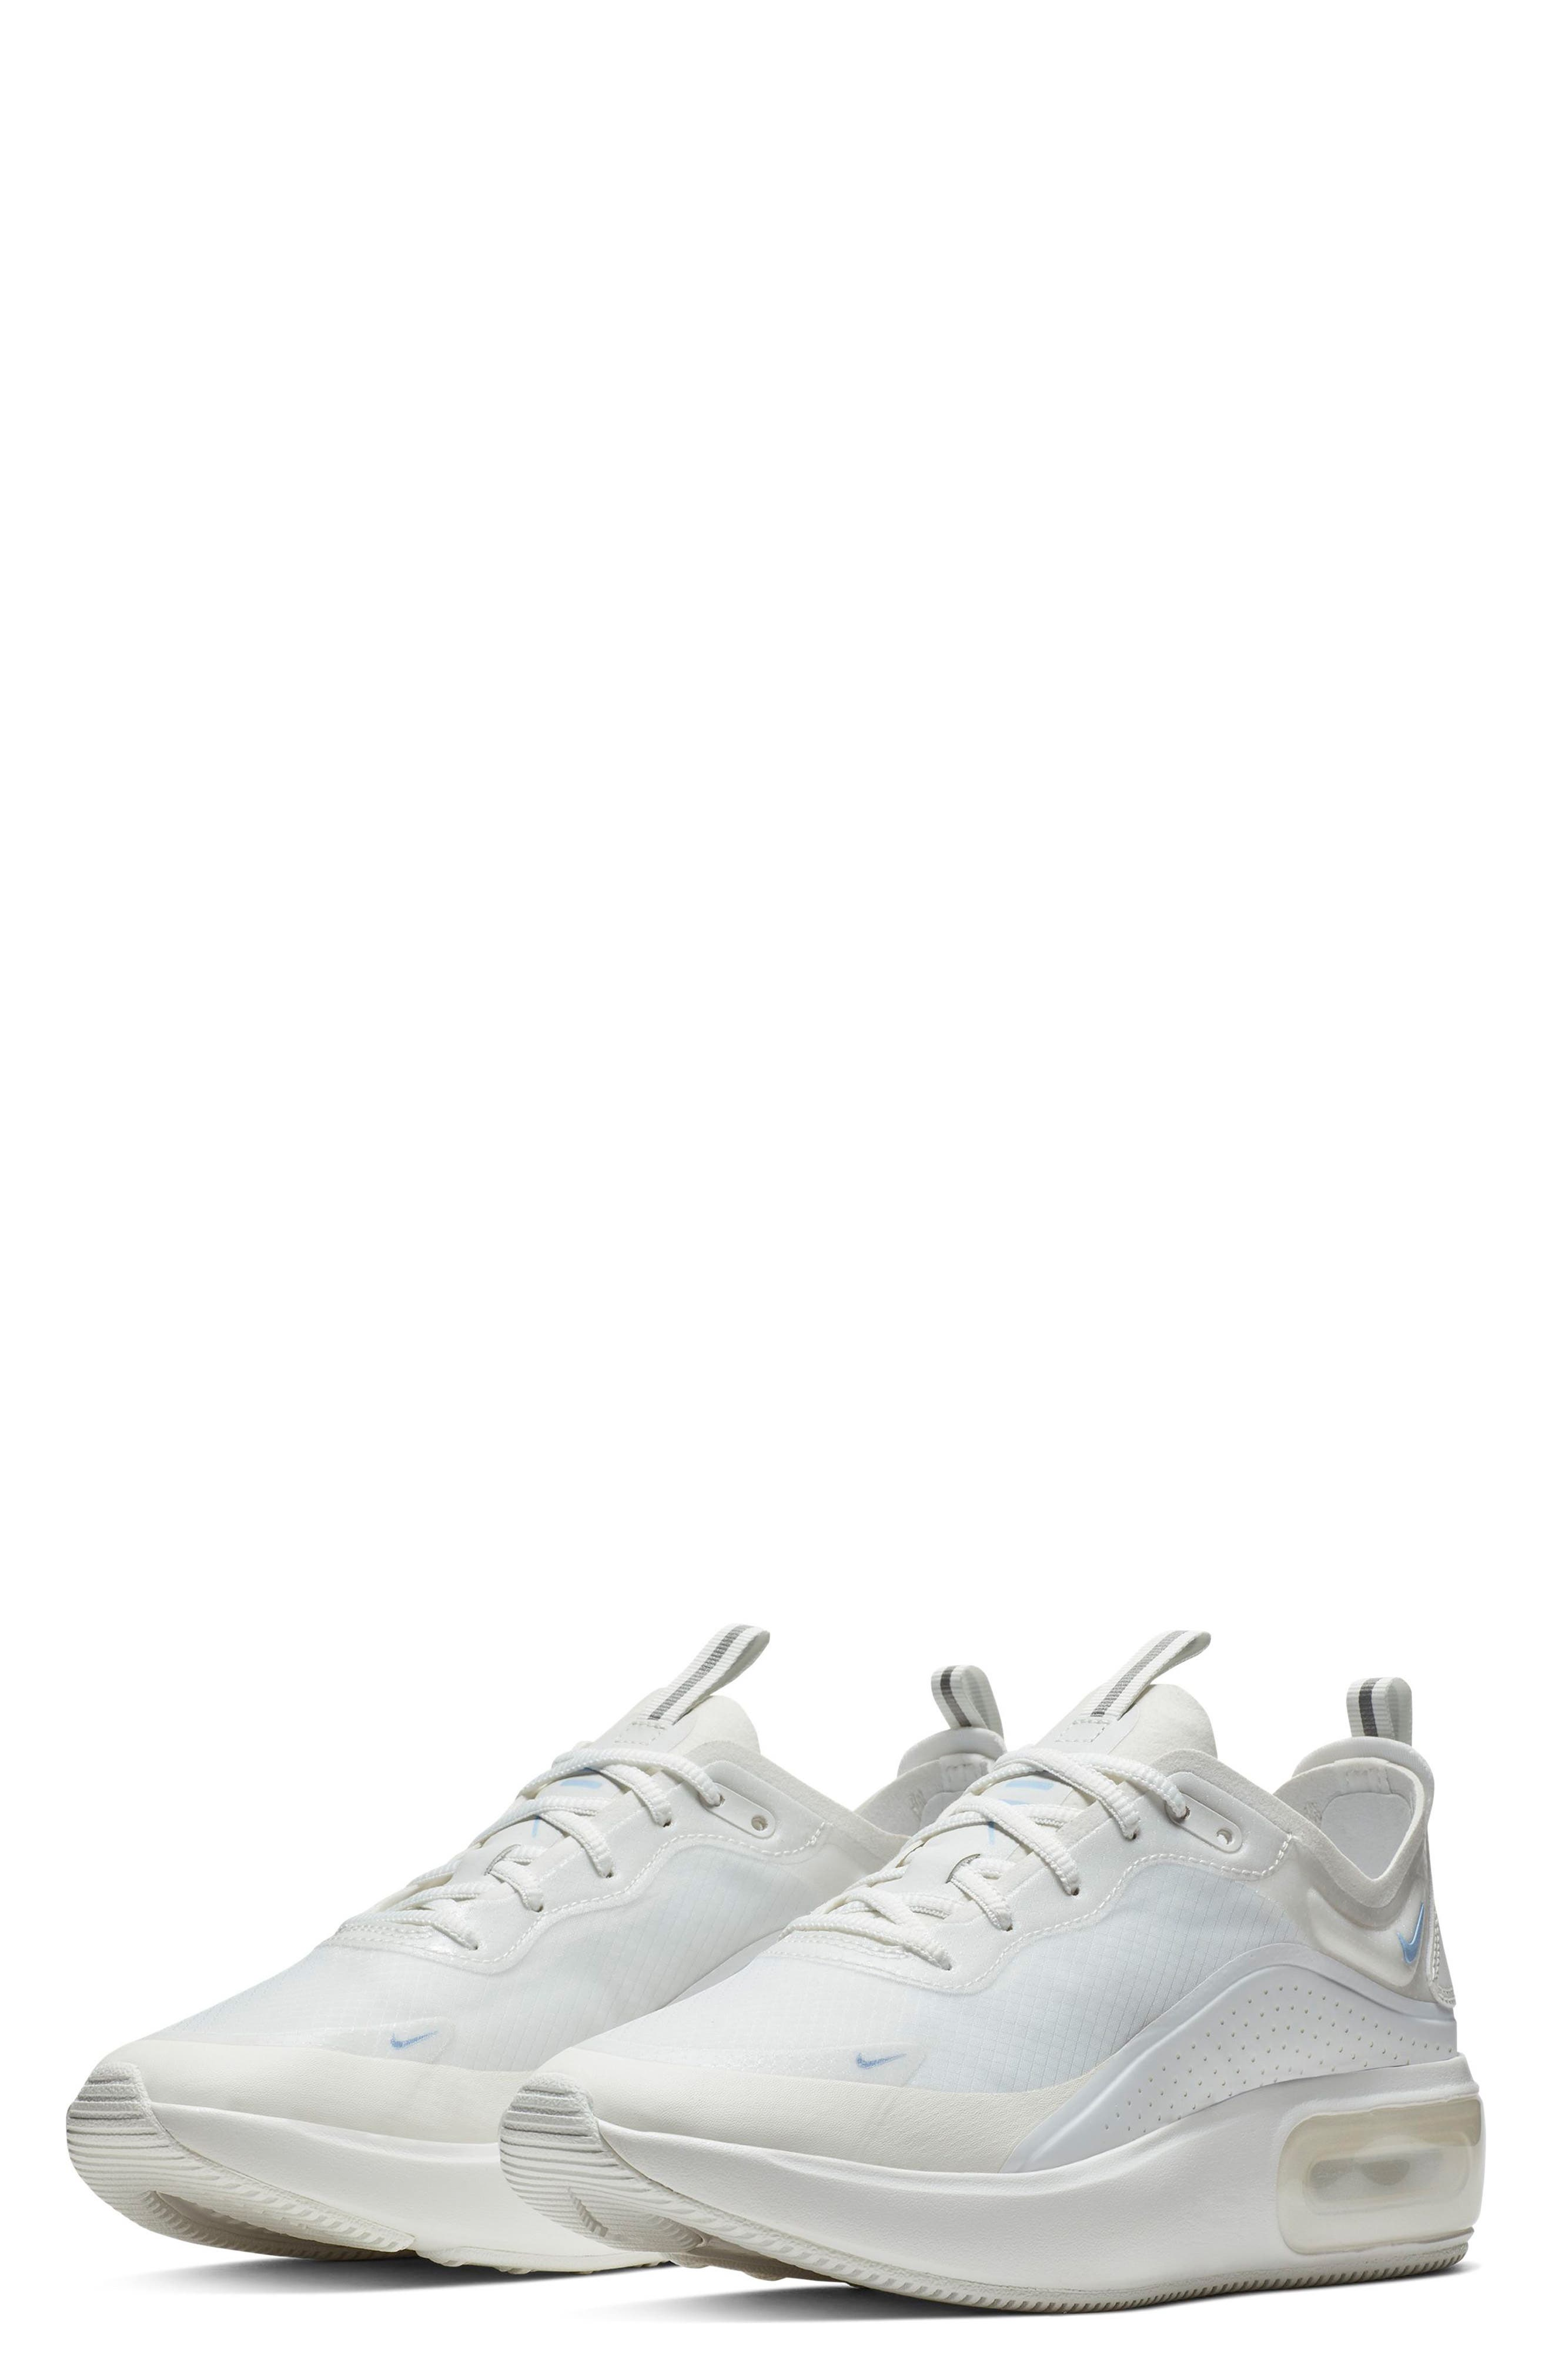 Air Max DIA SE Running Shoe, Main, color, WHITE/ ALUMINUM/ WHITE